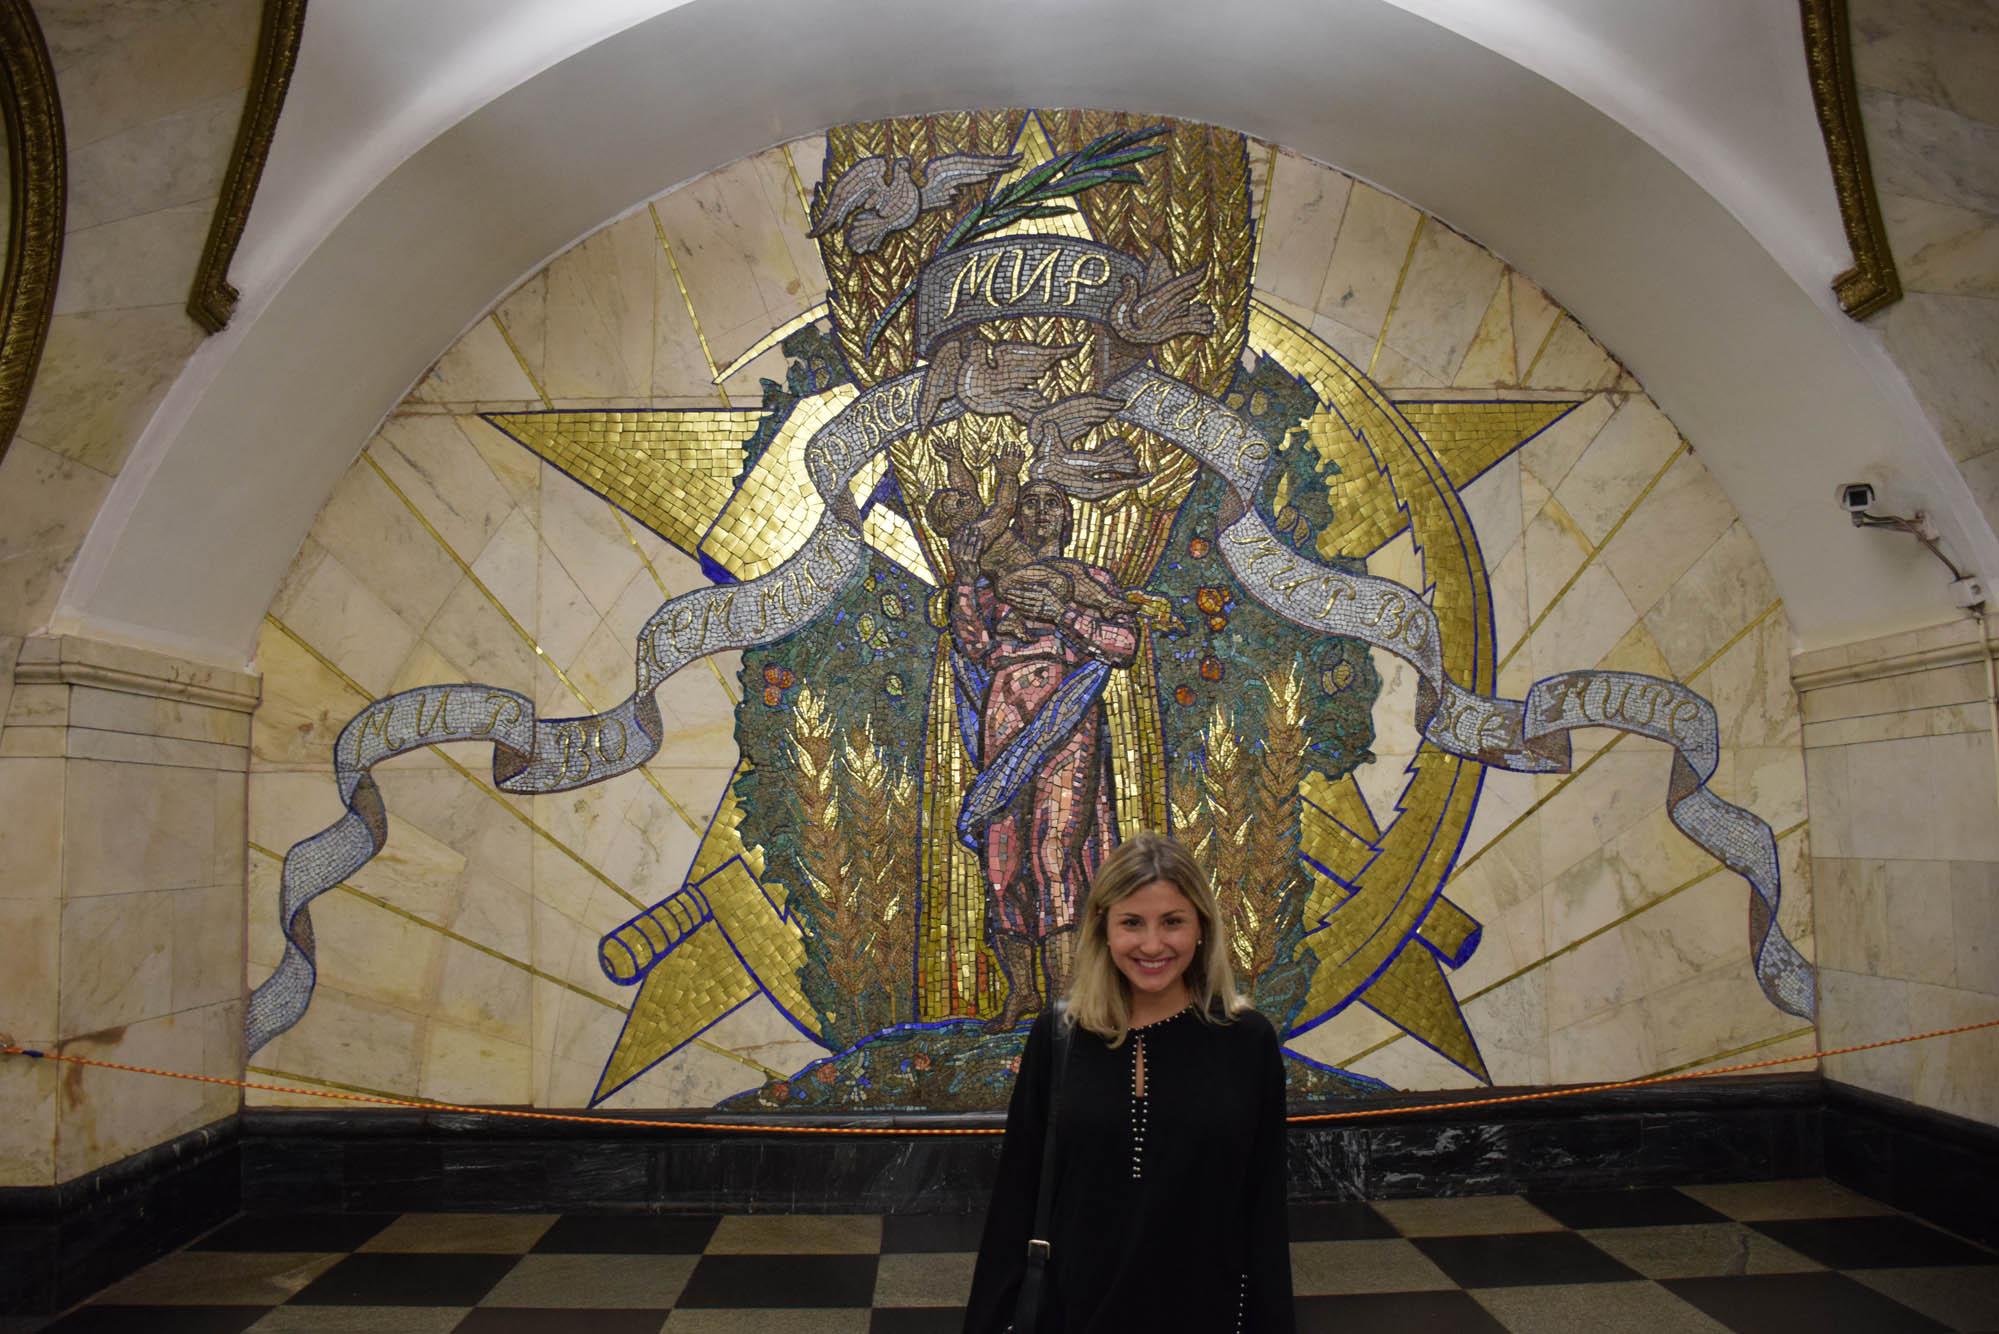 Novoslobodskaya estação metro moscou